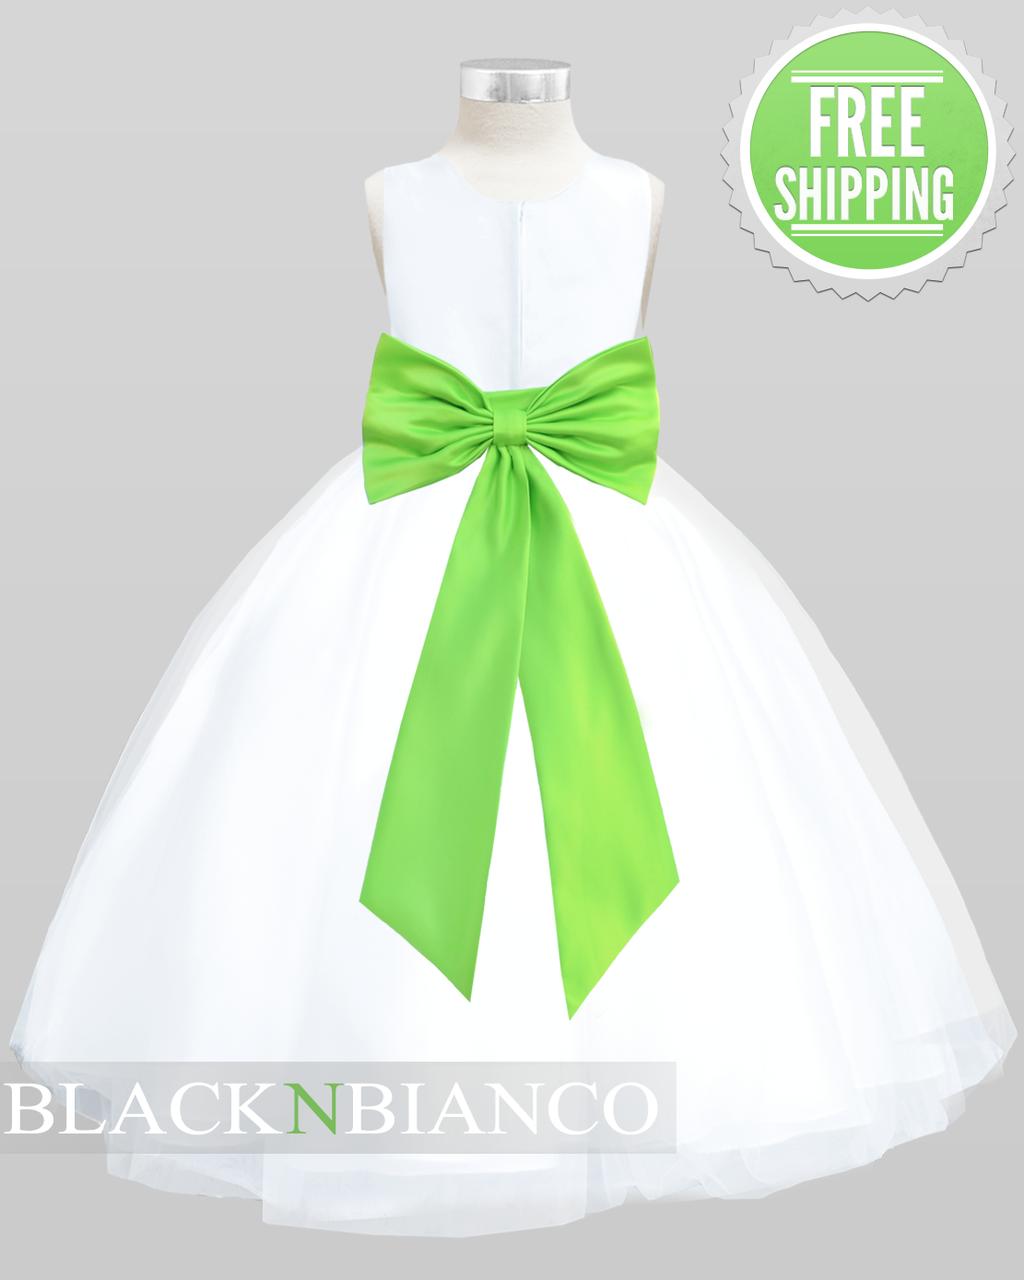 1b0eb7a6b7b White Sleeveless Satin Flower Girl Dress w  Vibrant Lime Green Bow